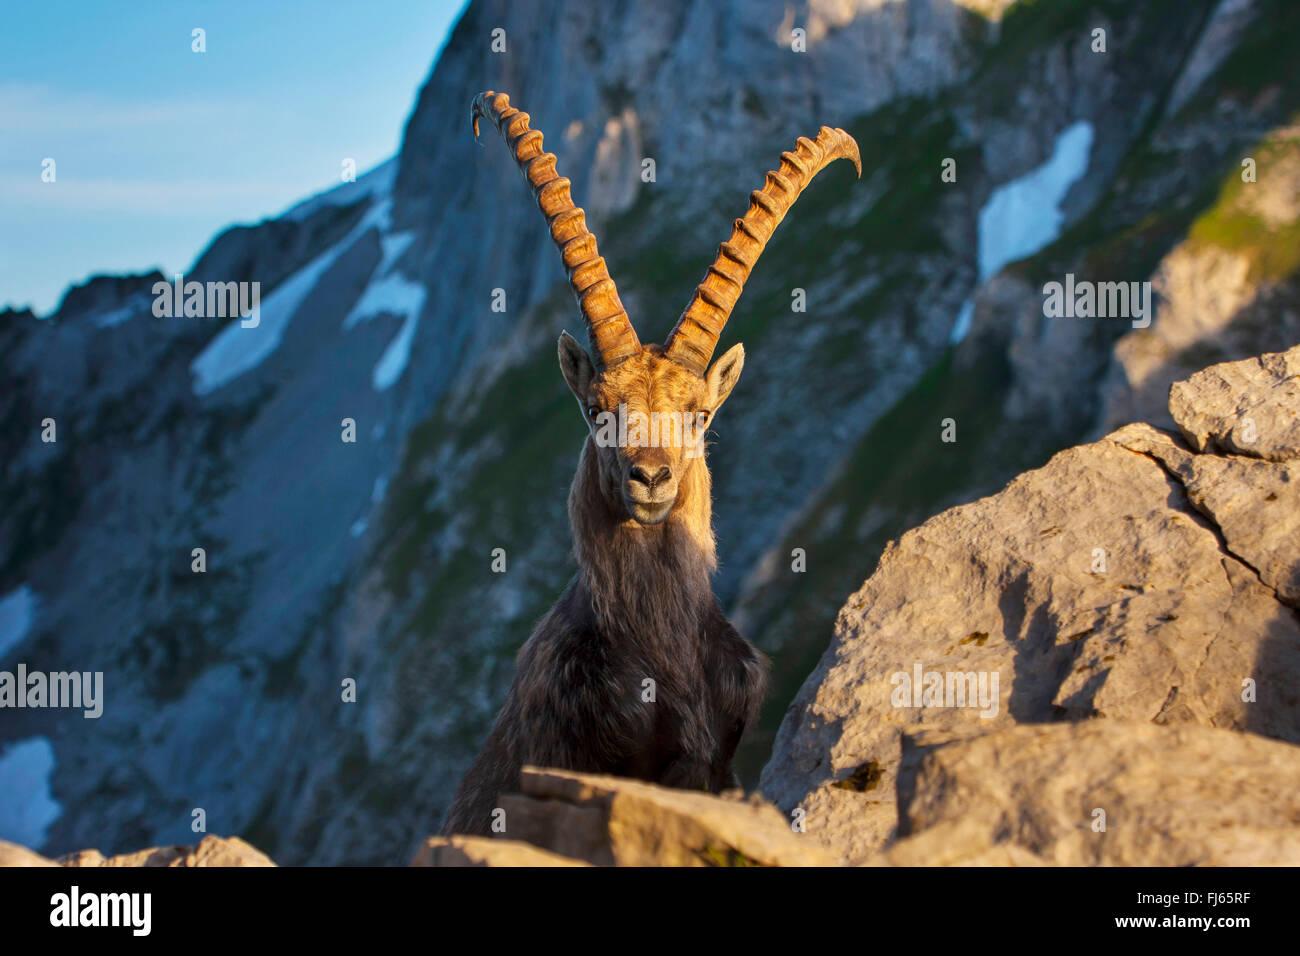 Alpine ibex (Capra ibex, Capra ibex ibex), in morning light in front of a mountain backdrop, Switzerland, Alpstein, - Stock Image